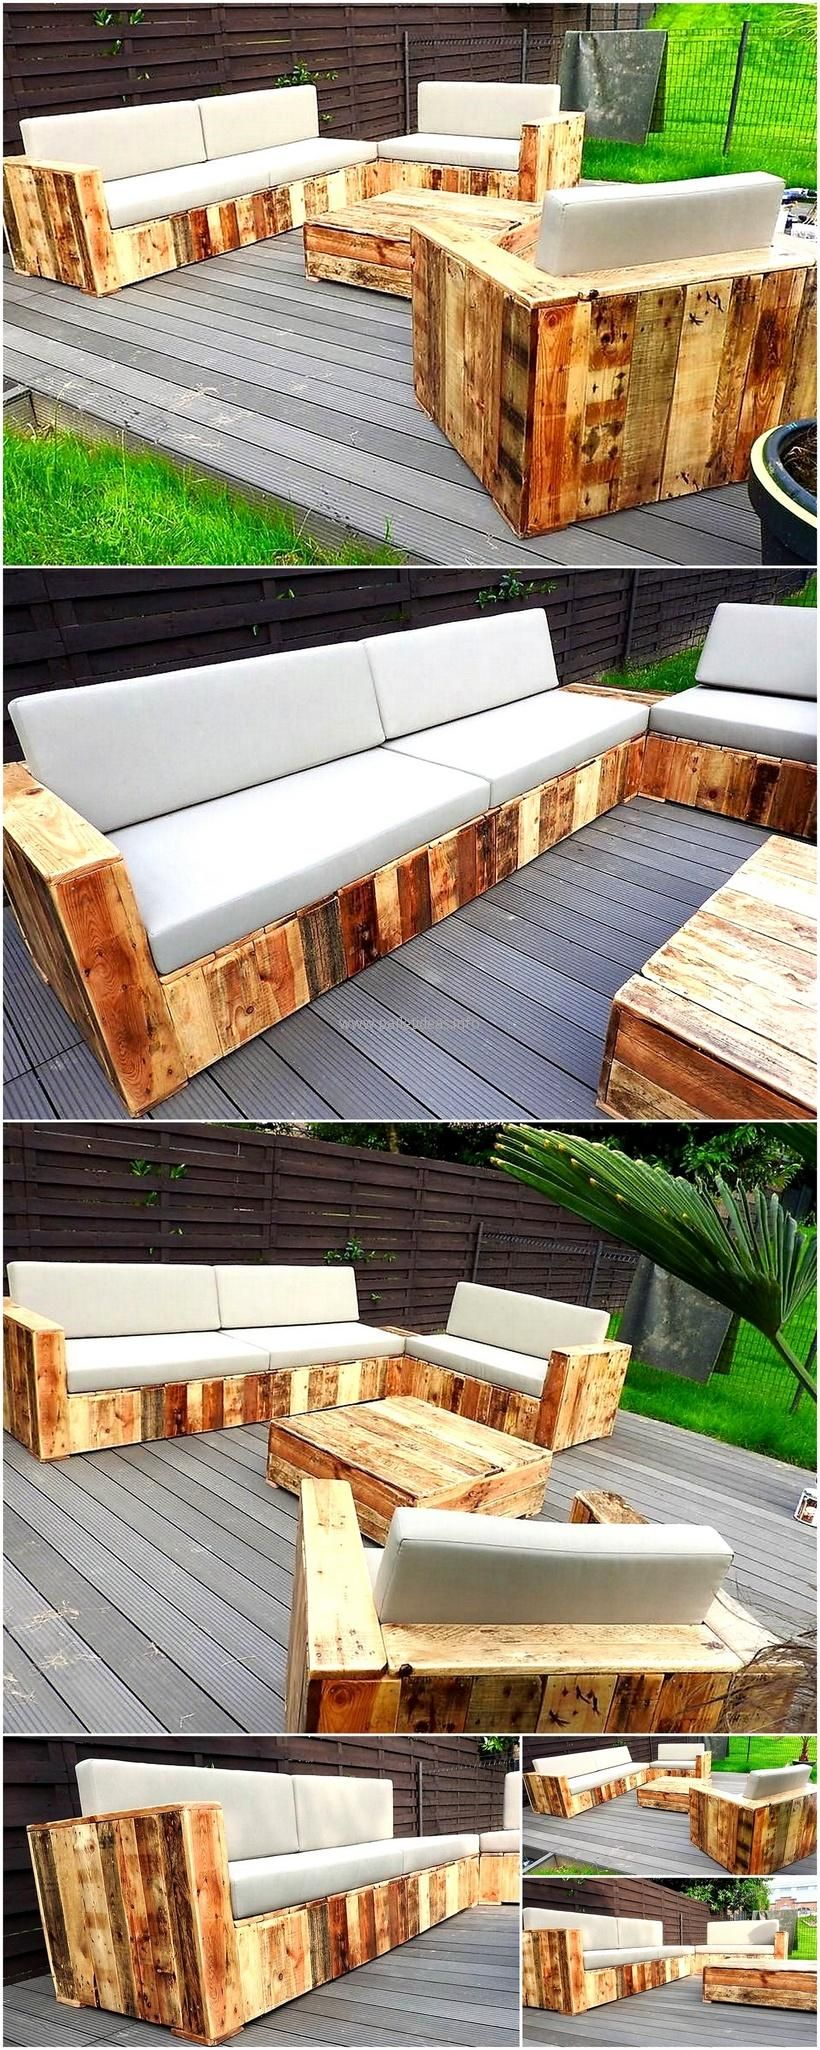 crate outdoor furniture. Pallet Outdoor Garden Furniture Crate R